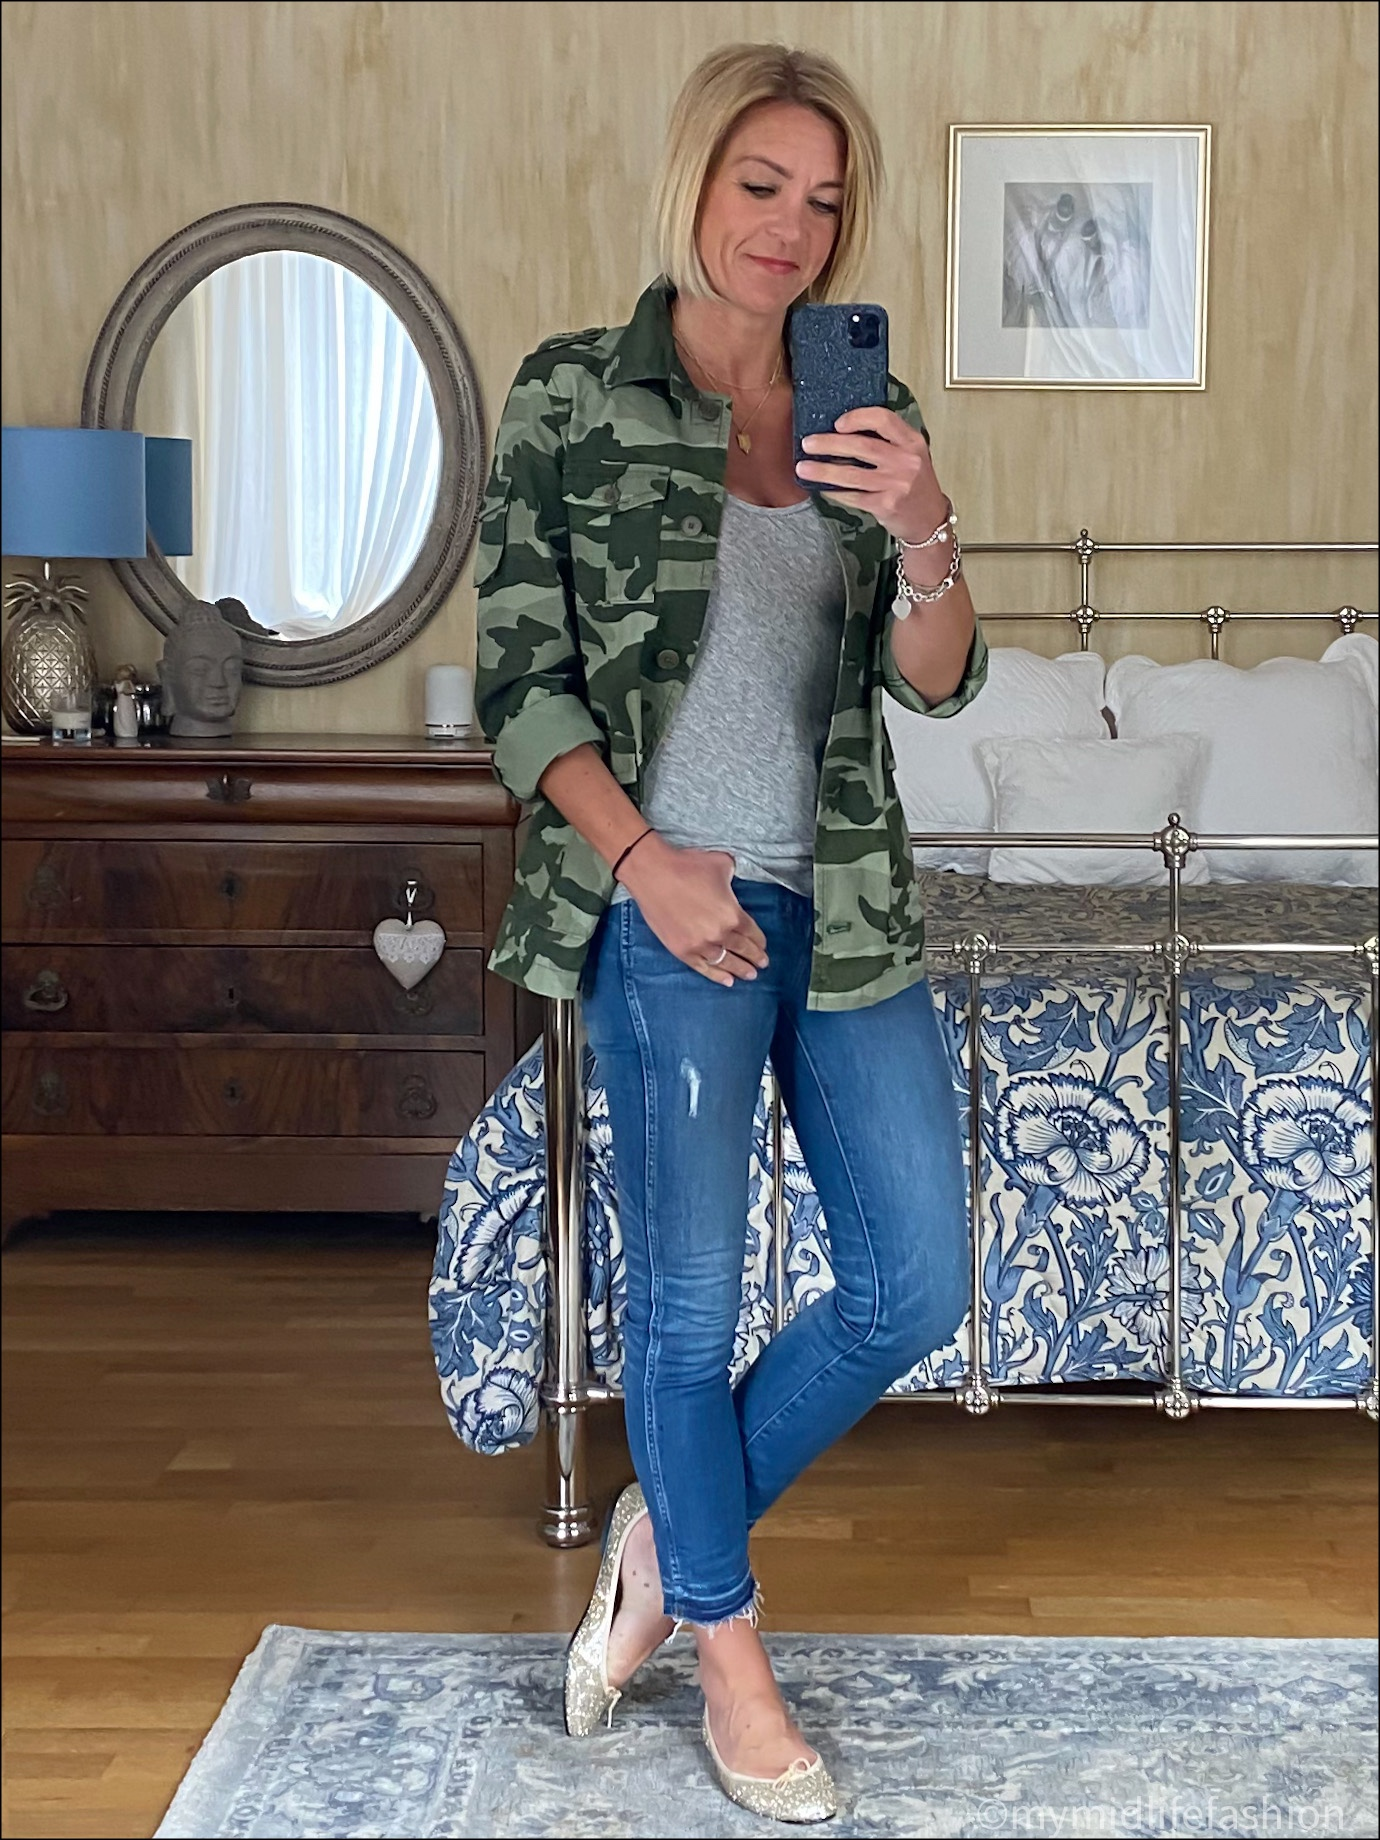 my midlife fashion, j crew camouflage overshirt, j crew tank tee, j crew 9 inch toothpick skinny jeans, French sole Henrietta glitter ballet pumps